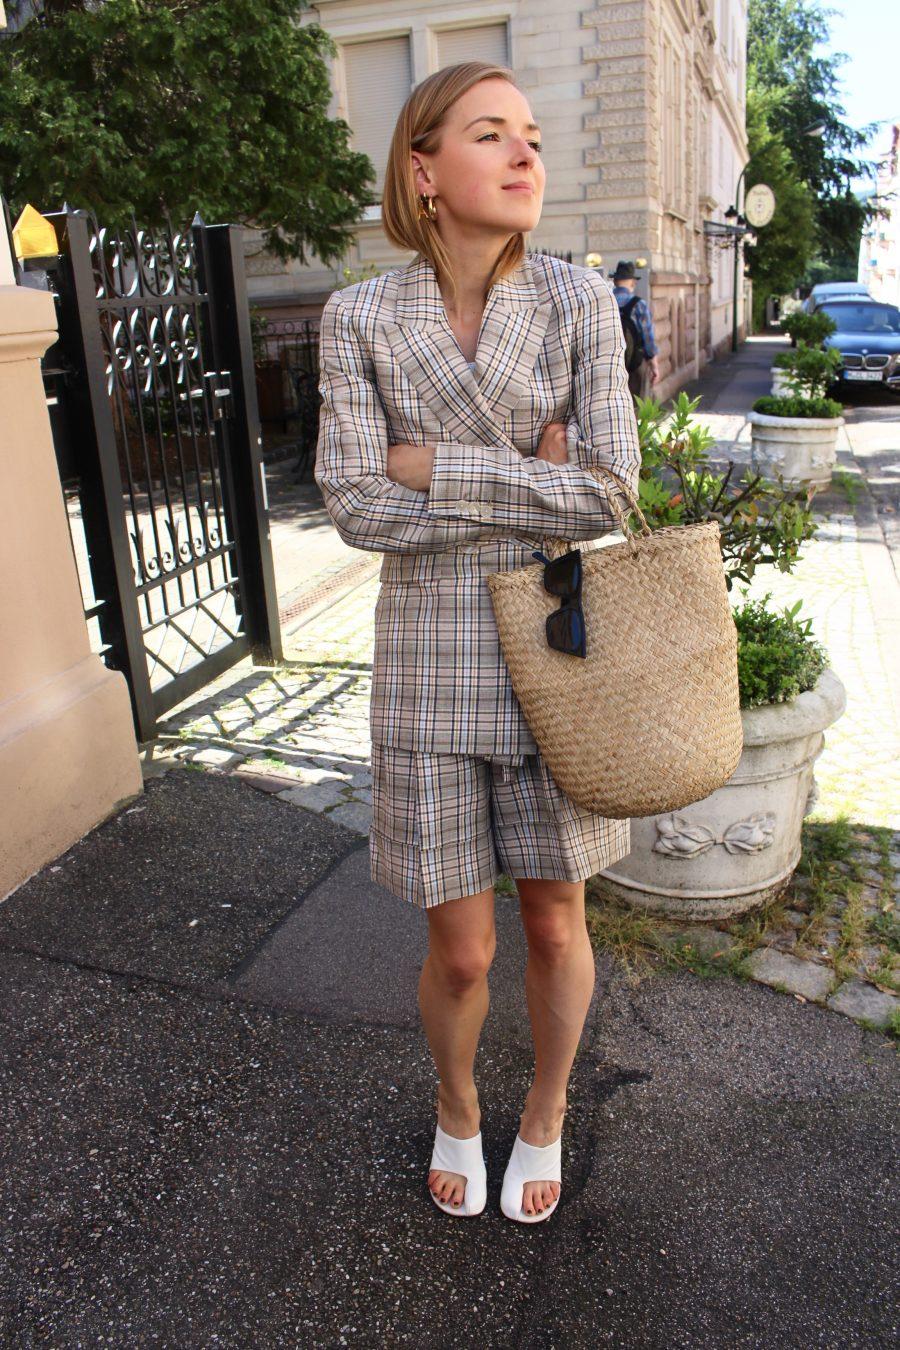 The Massimo Dutti Suit